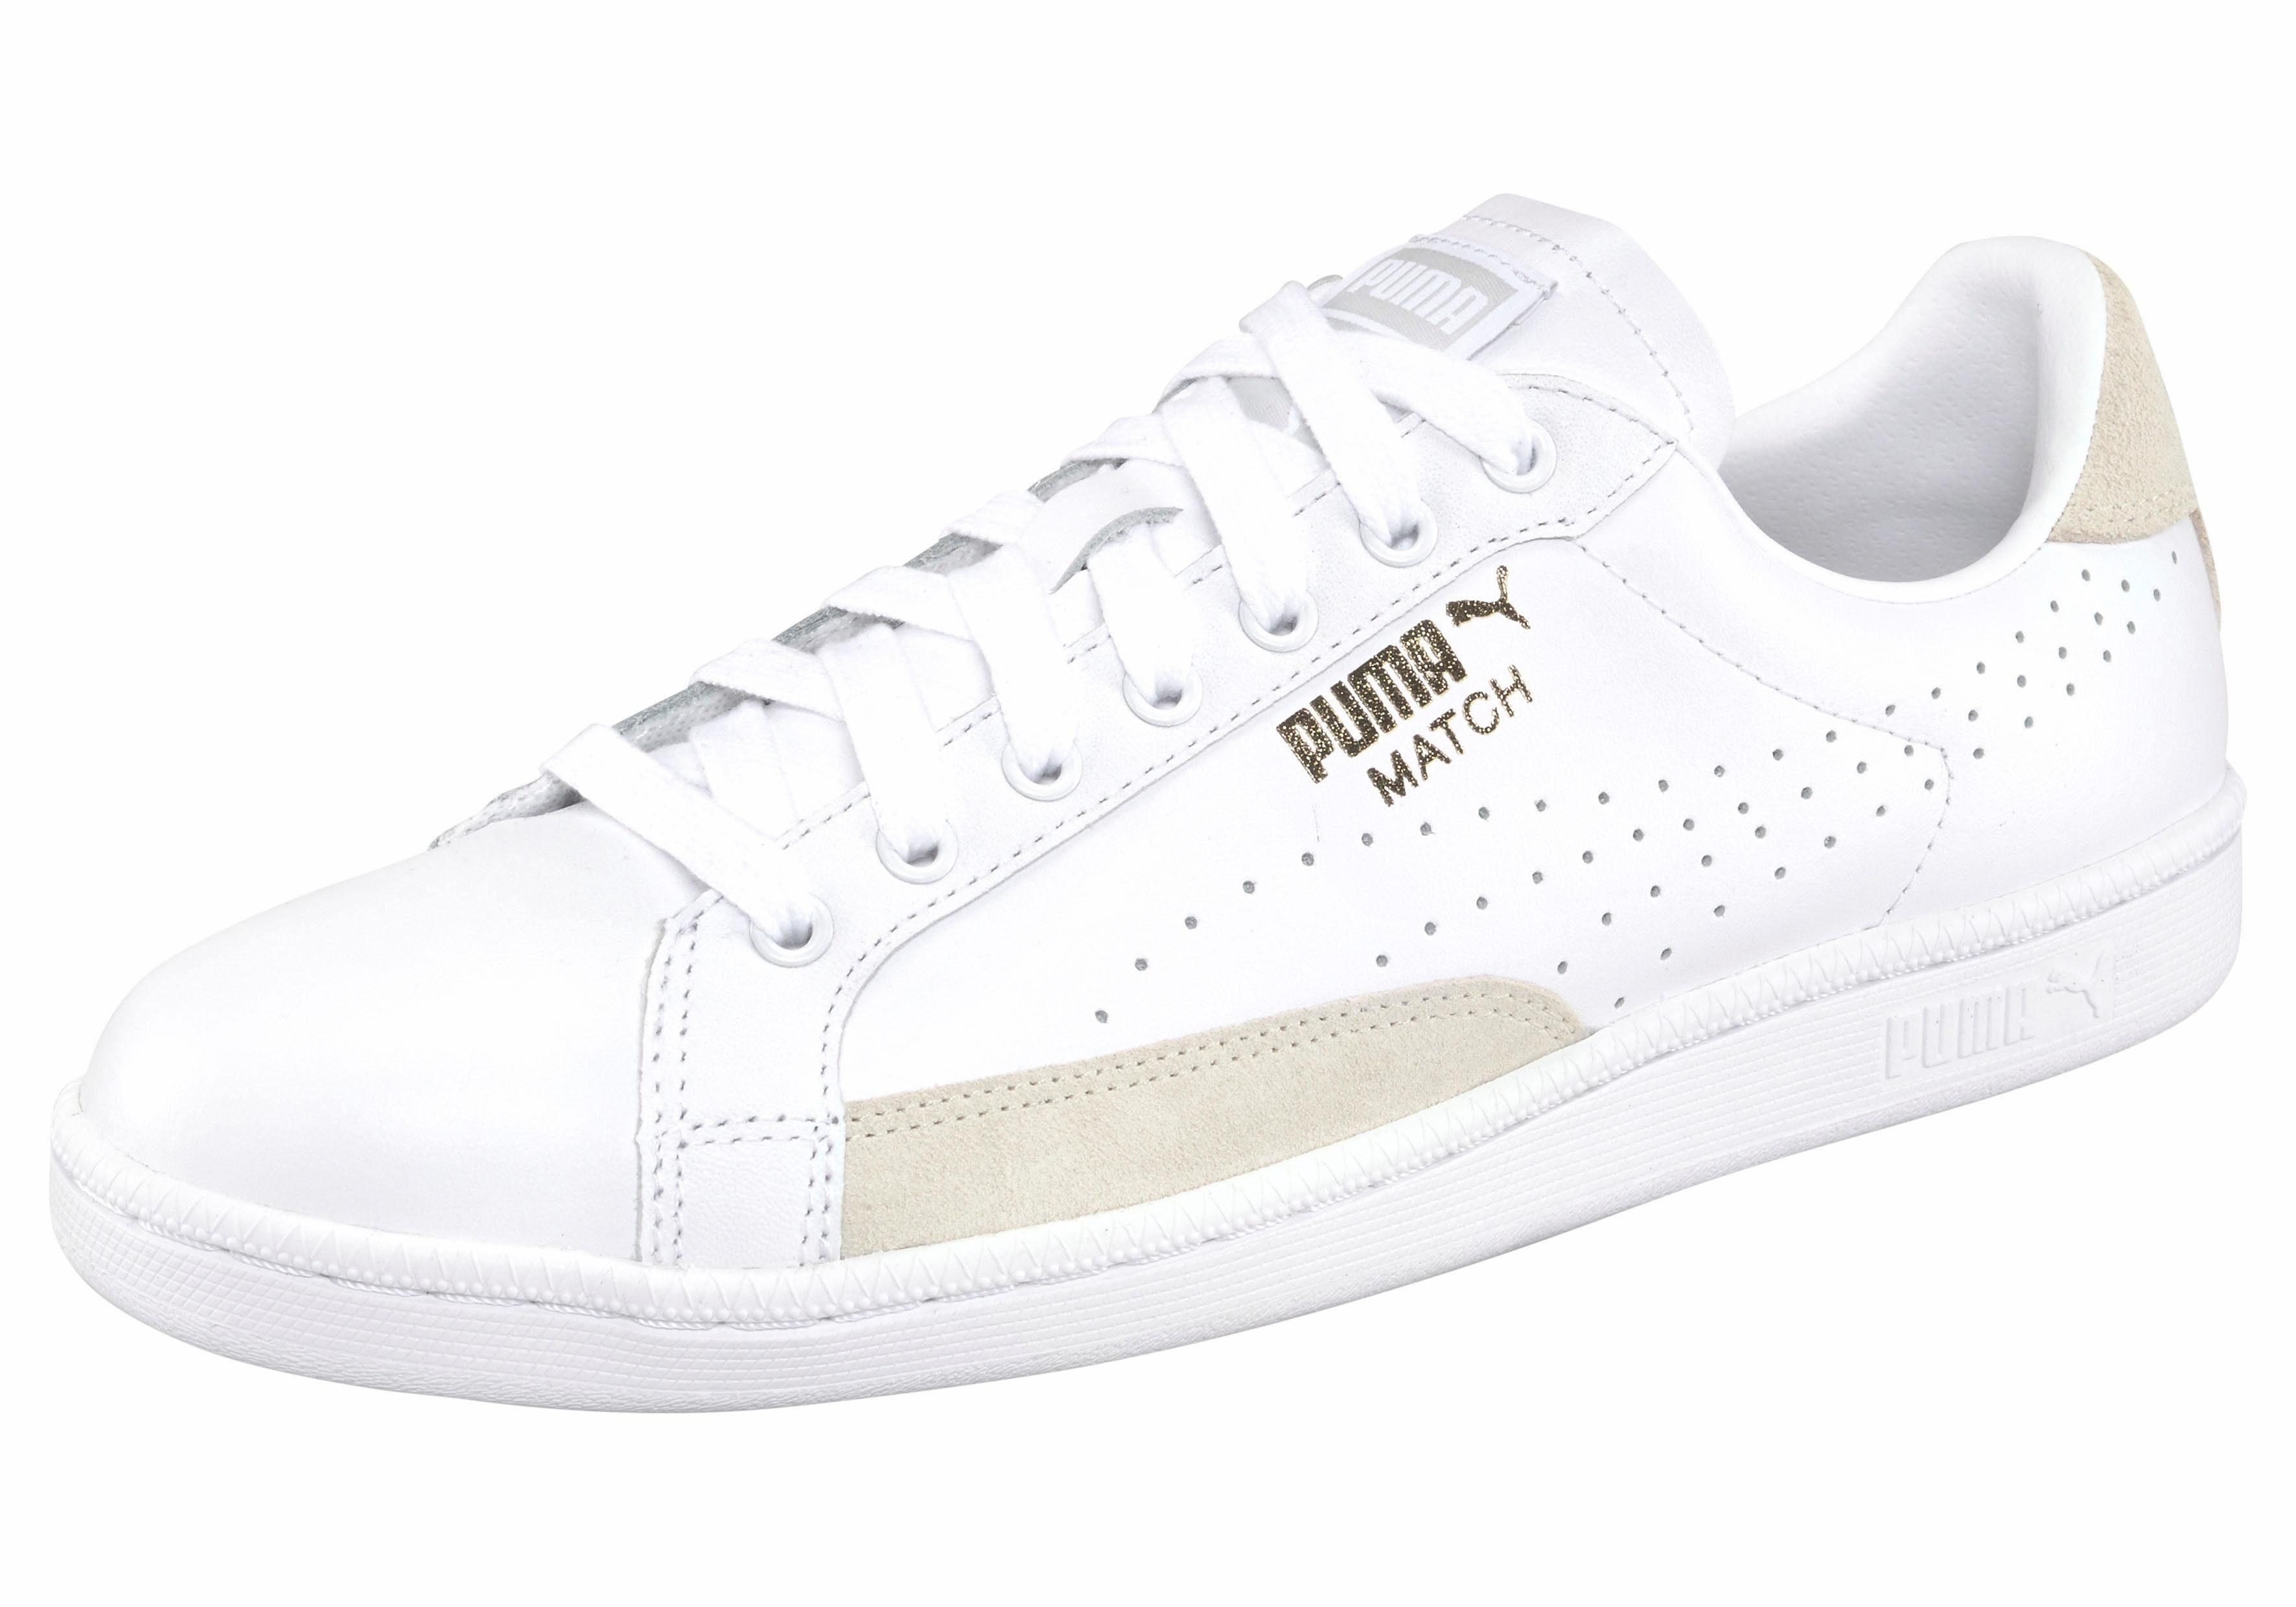 Unisexe Pumas Runningschuhe Tsugi Sommet Sneaker - Esprit - 43 Eu Ca4Pxv